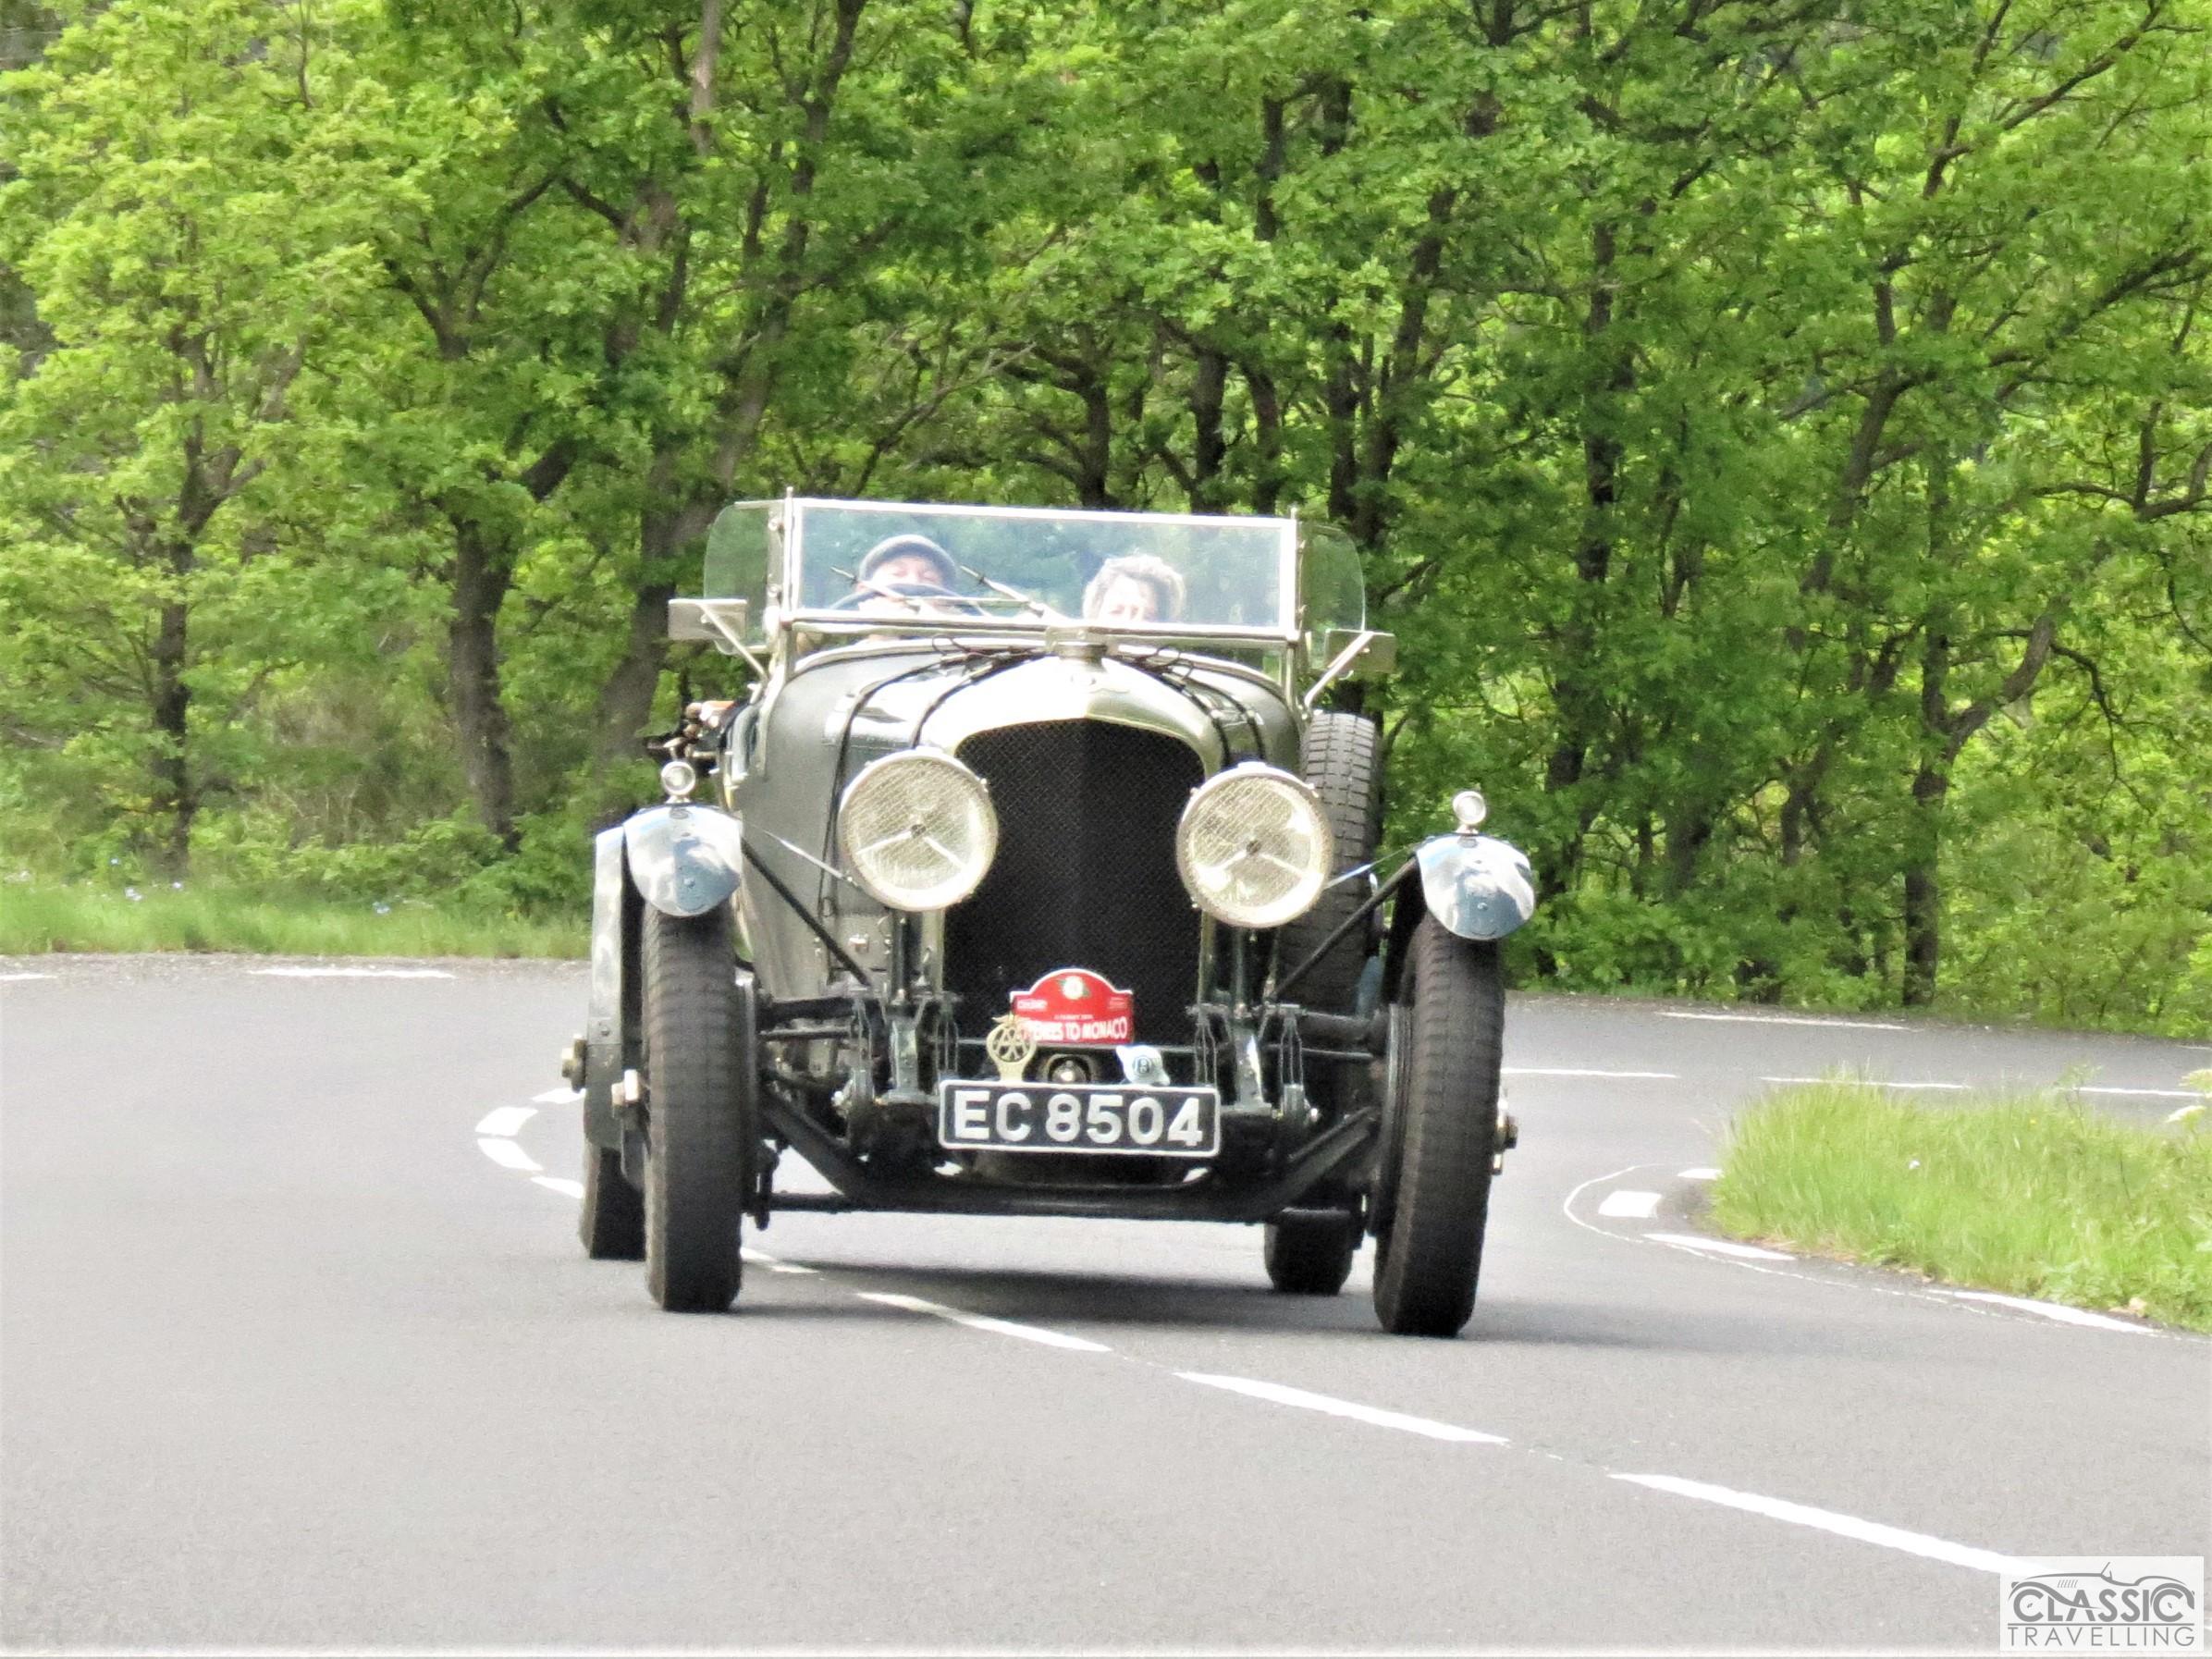 Bentley Driving Tour to Monaco Photo Gallery